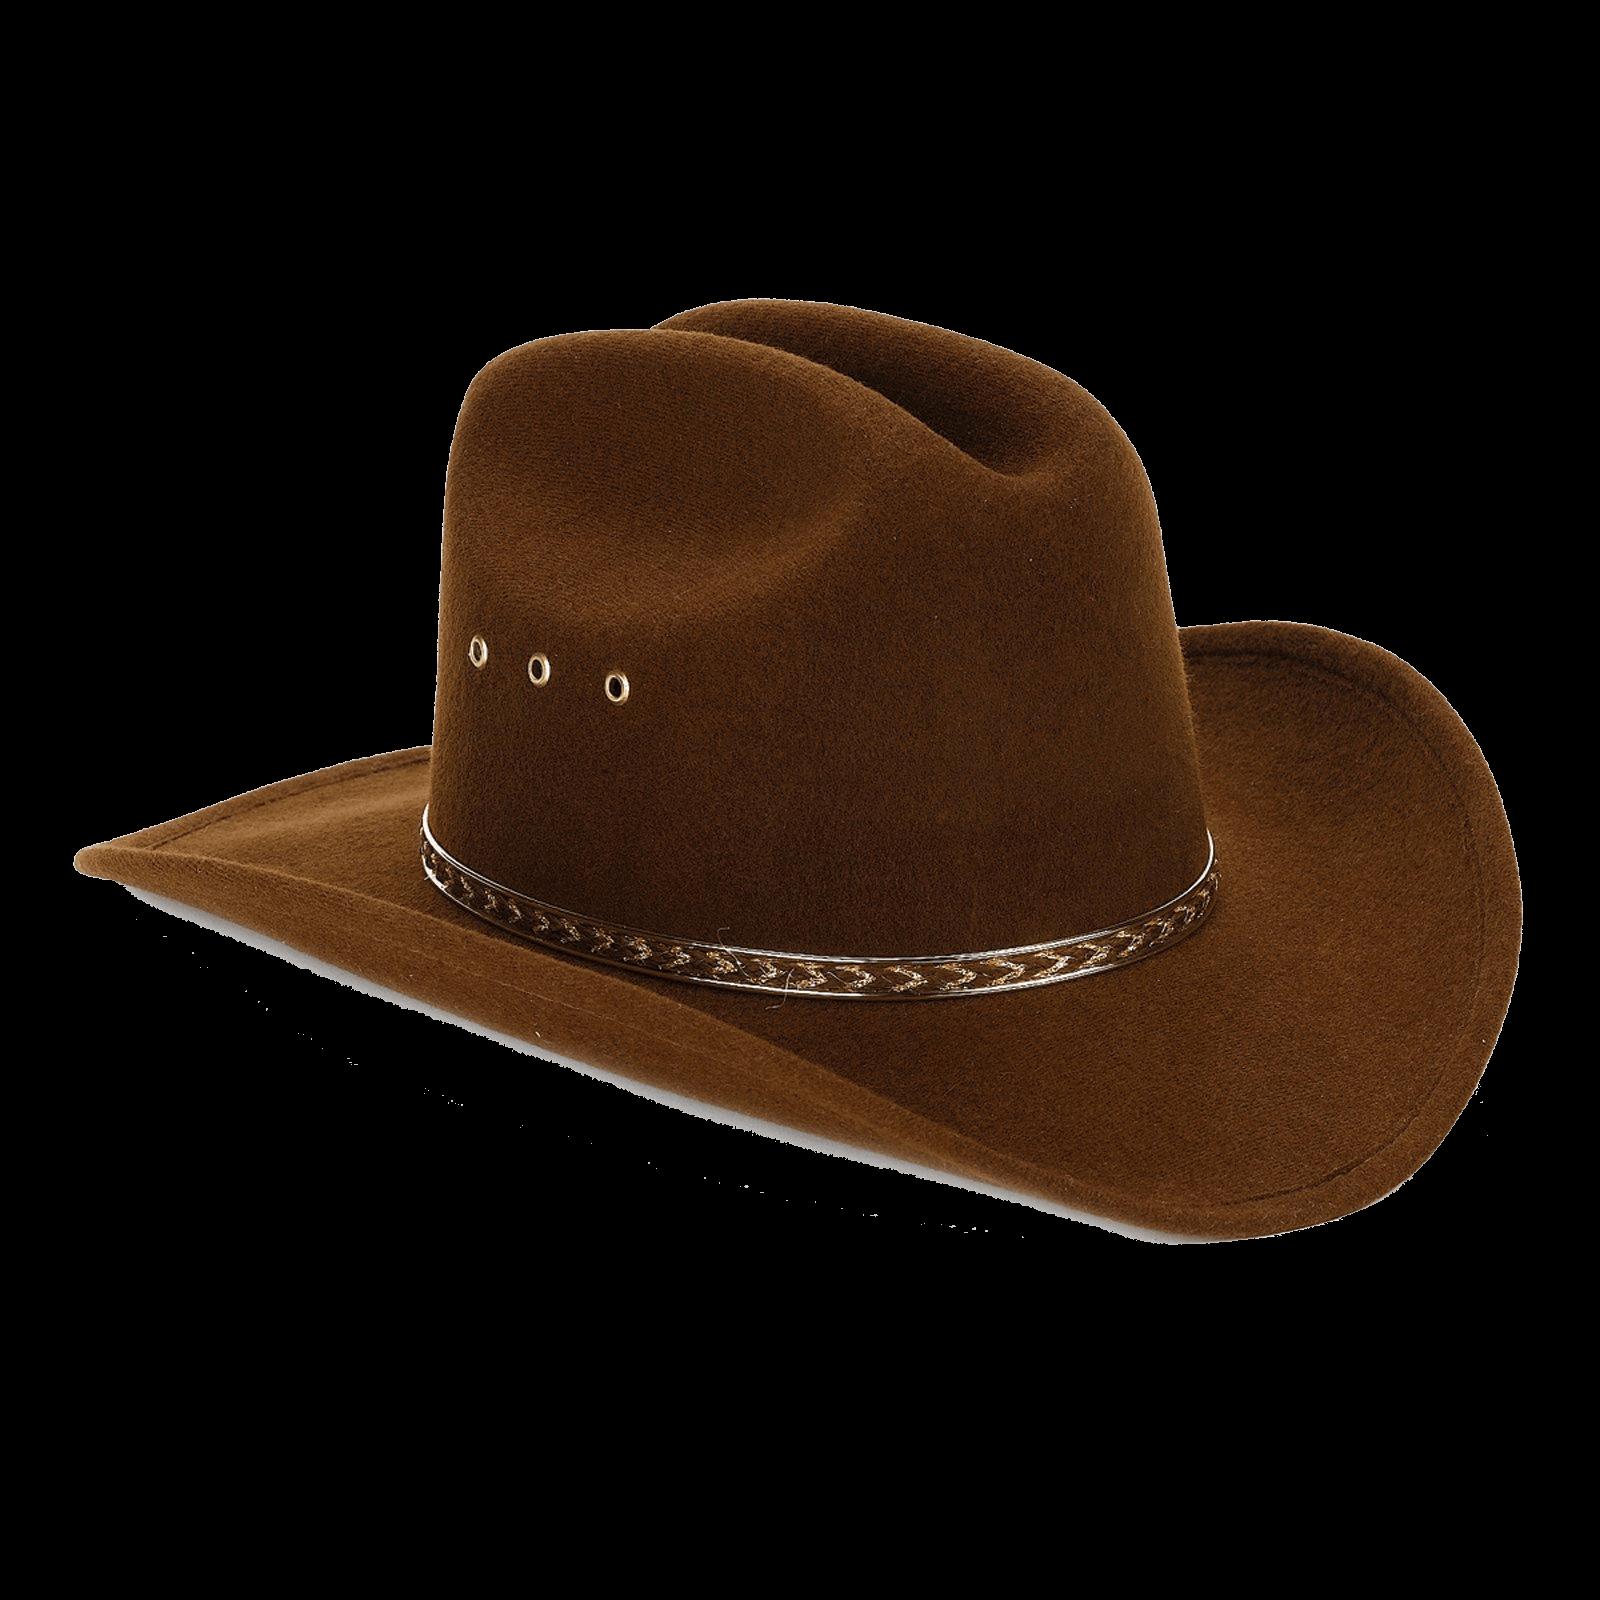 Cowboy Hat Brown Felt - Cowboy Hat PNG